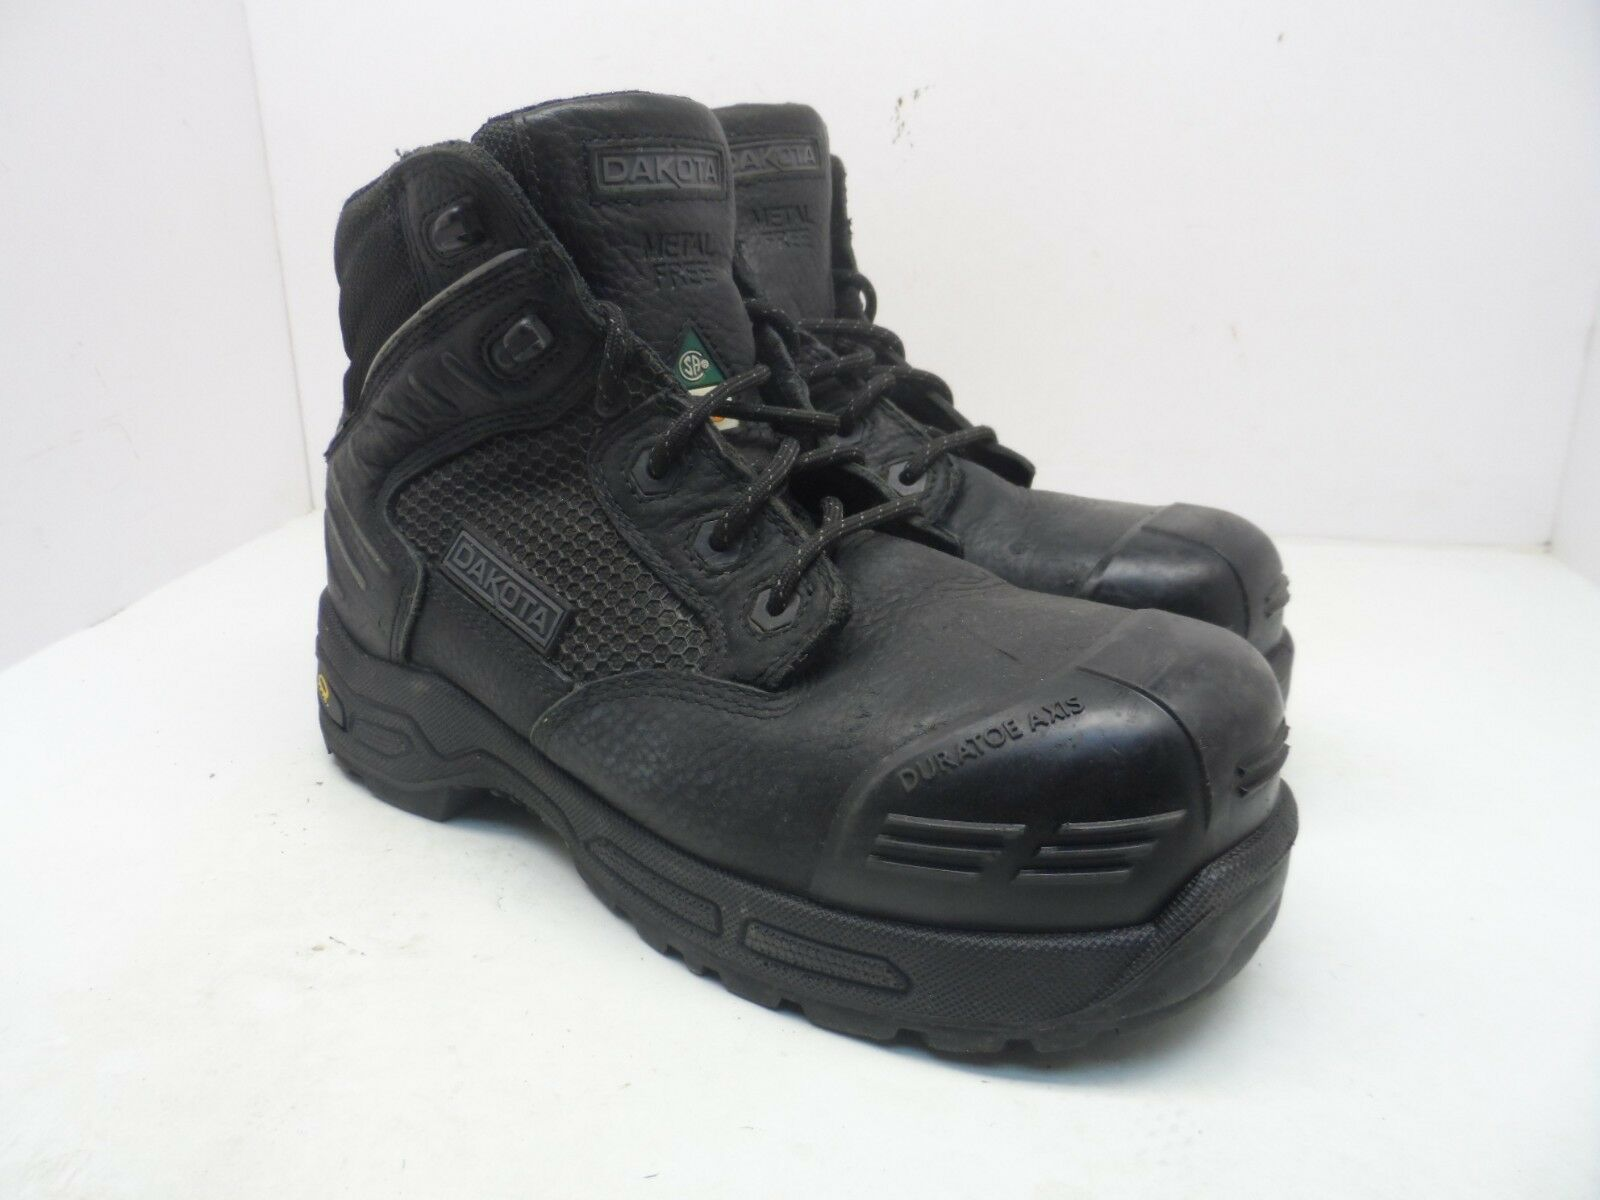 DAKOTA Men's 6 6410 Composite Toe Composite Plate Injected Work Boot Black 9.5M